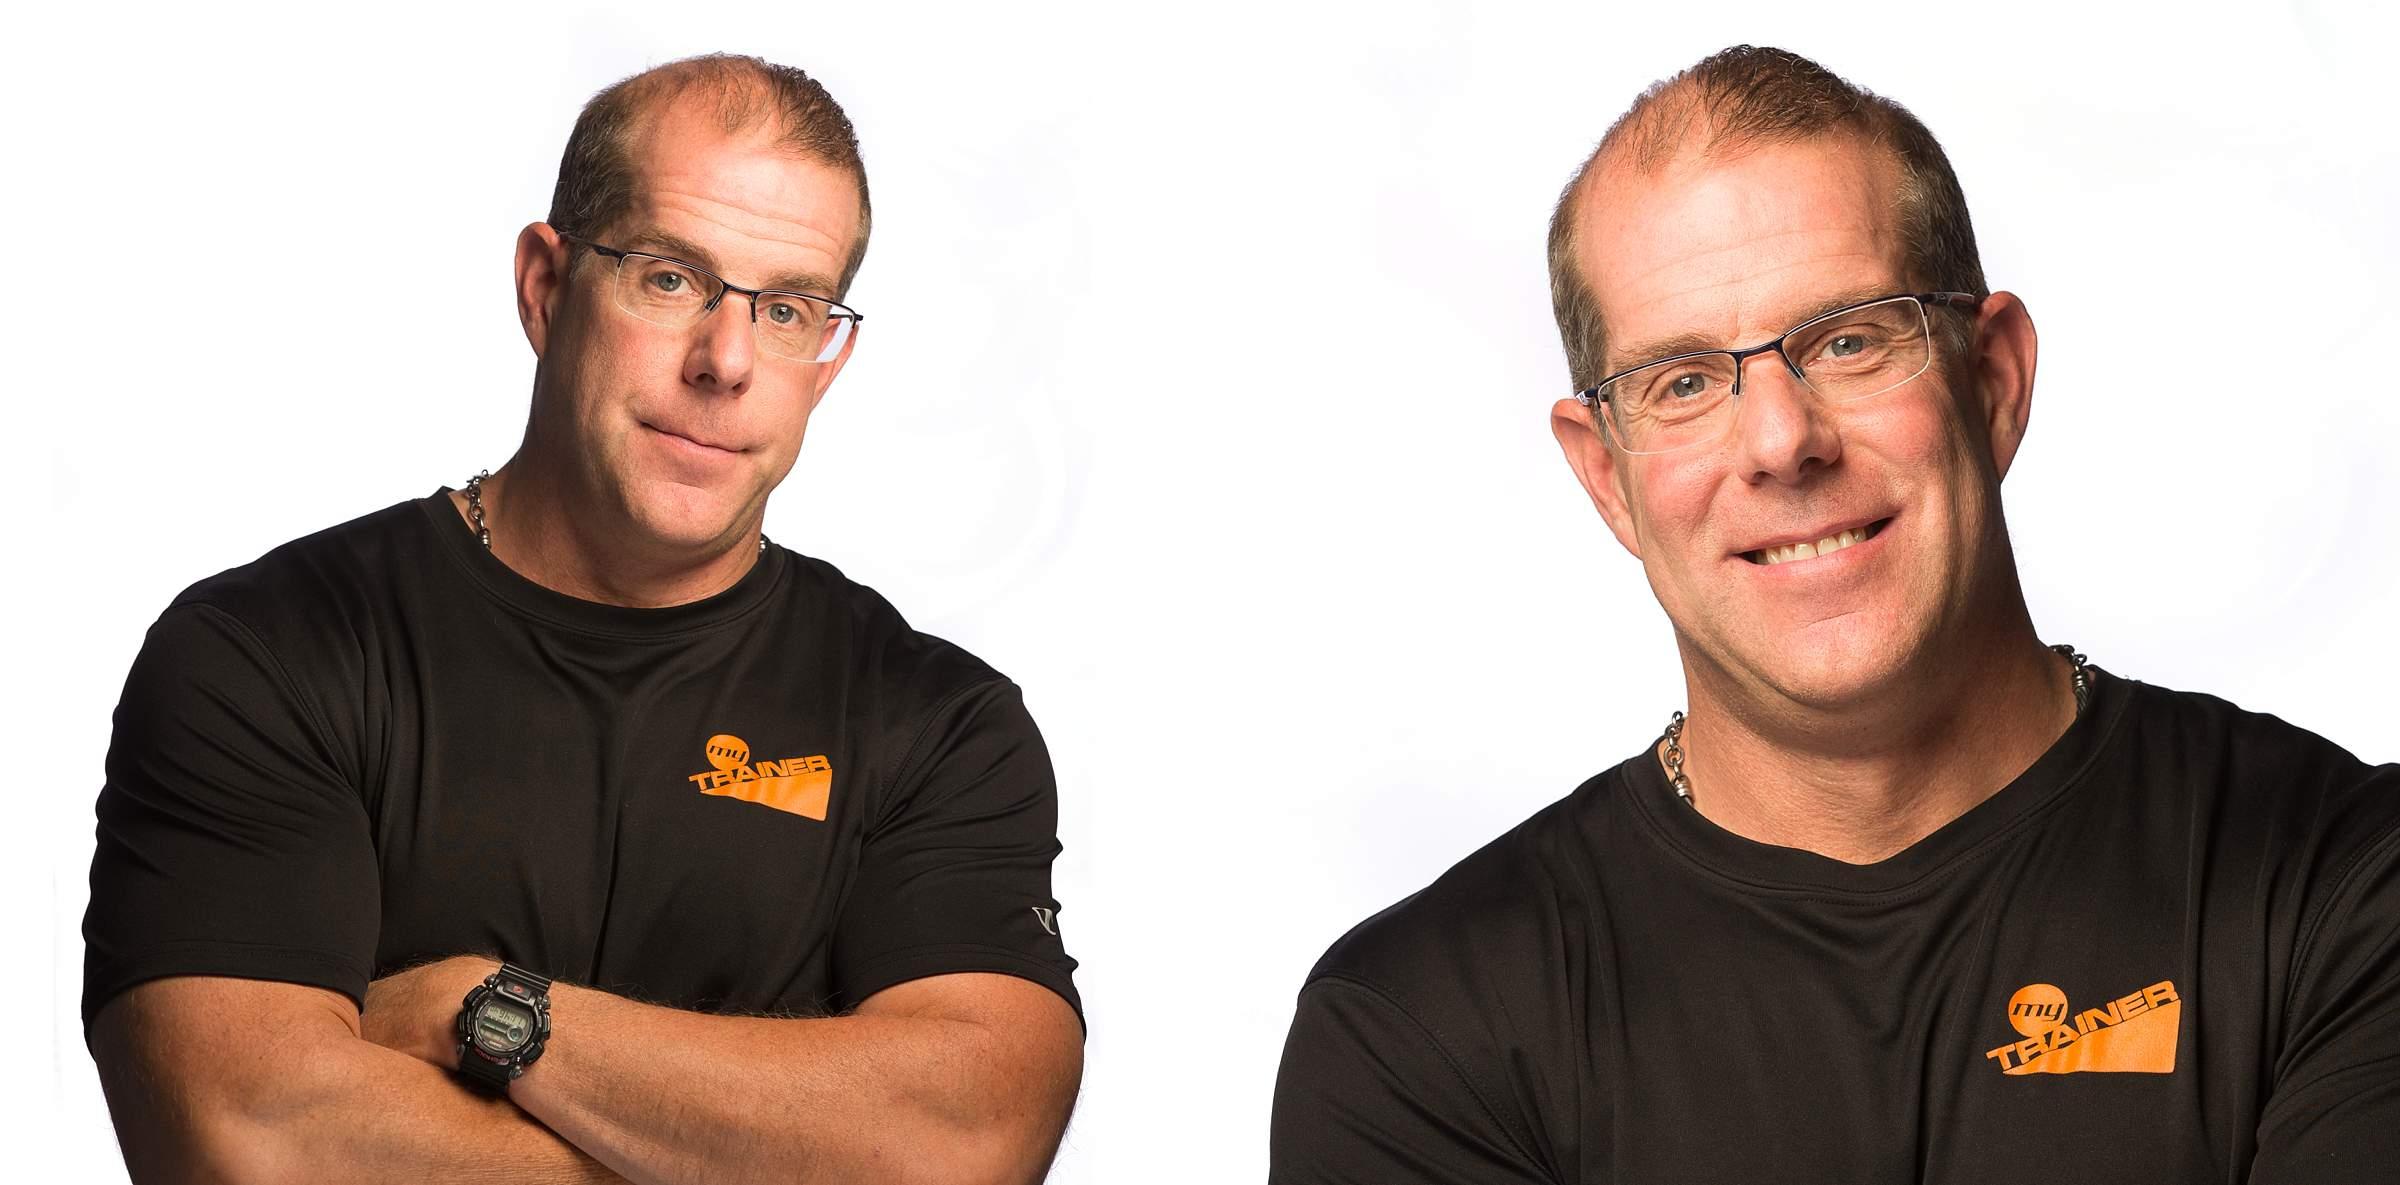 Gym Personal Trainer Portraits Chicago Headshots Tom Schmidt